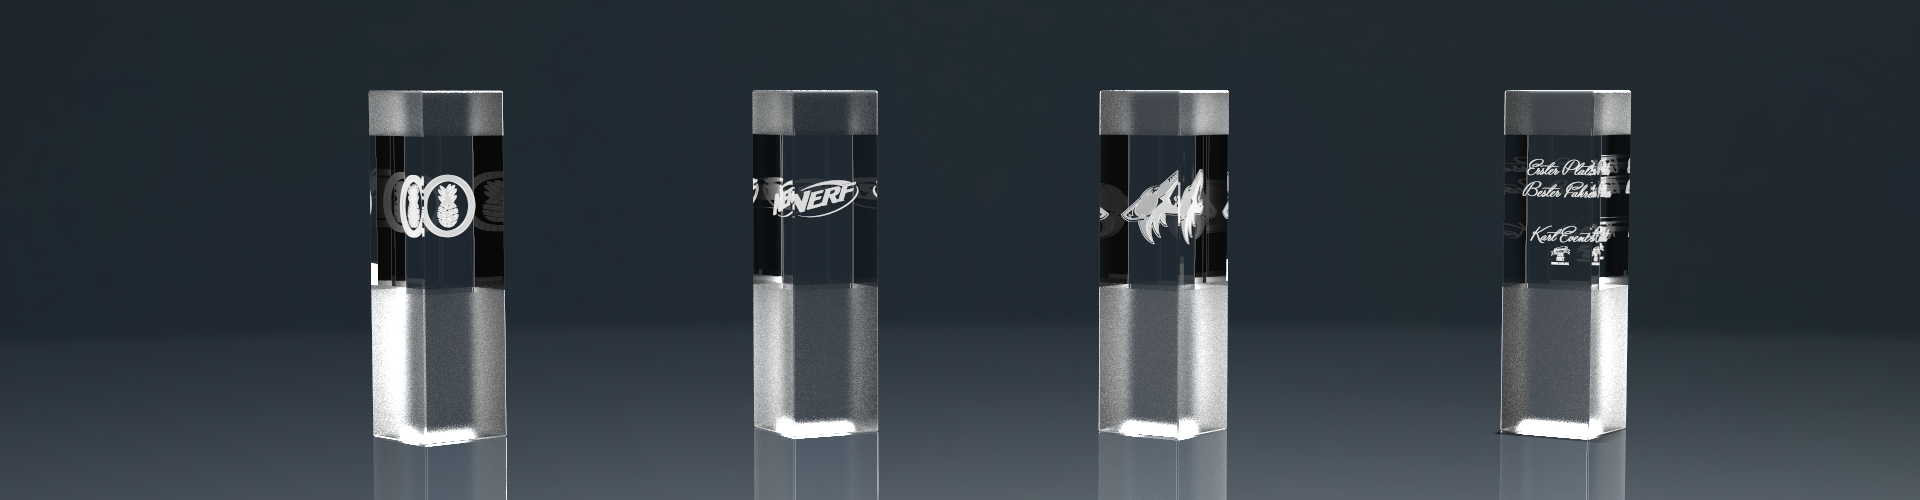 Vier Glaspokale Trophy Frost mit Lasergravur